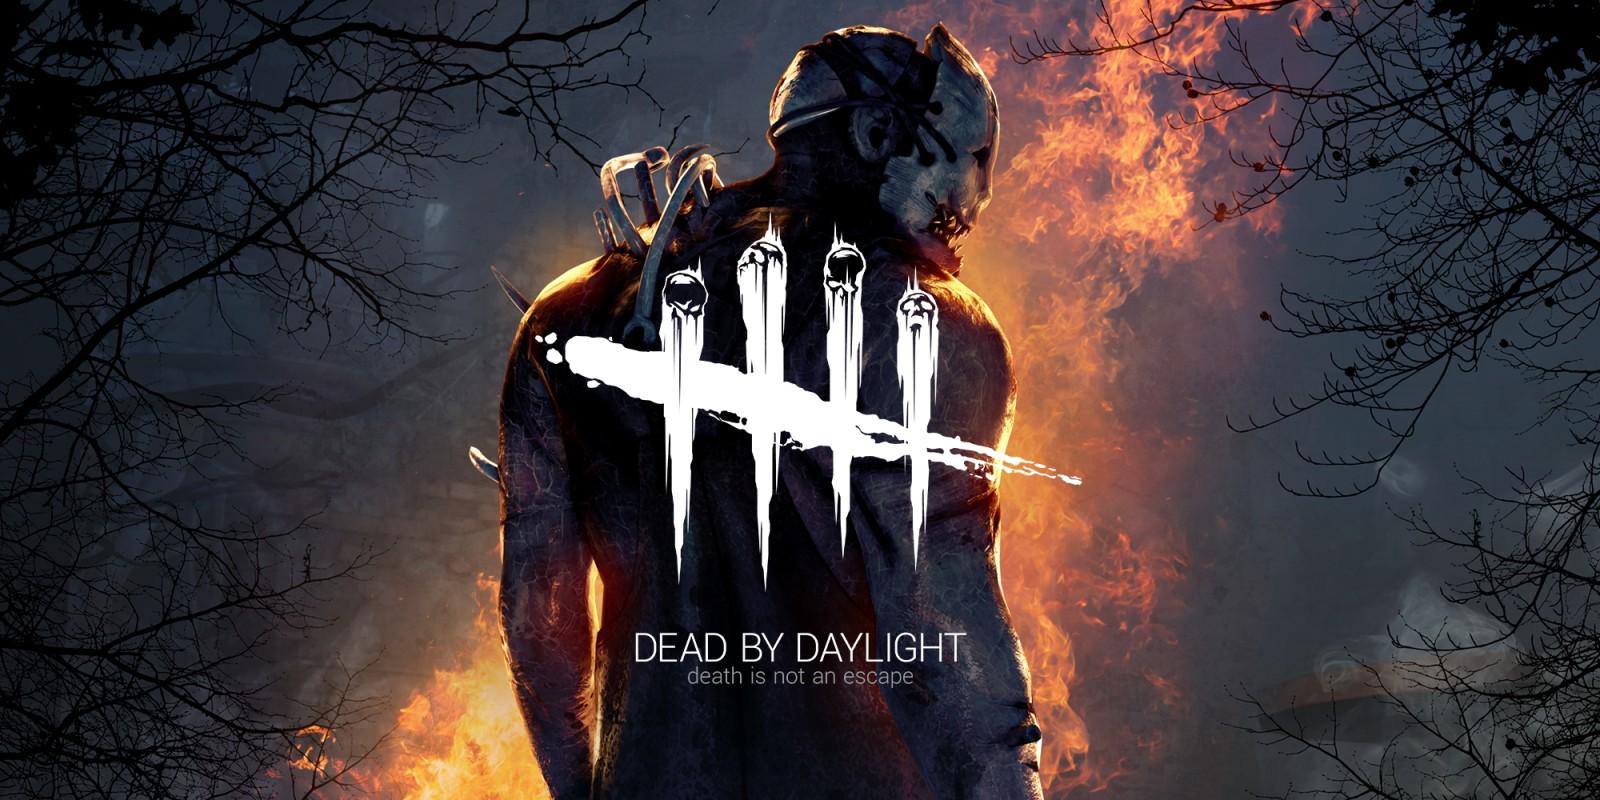 Dead by Daylight mundo sombrio